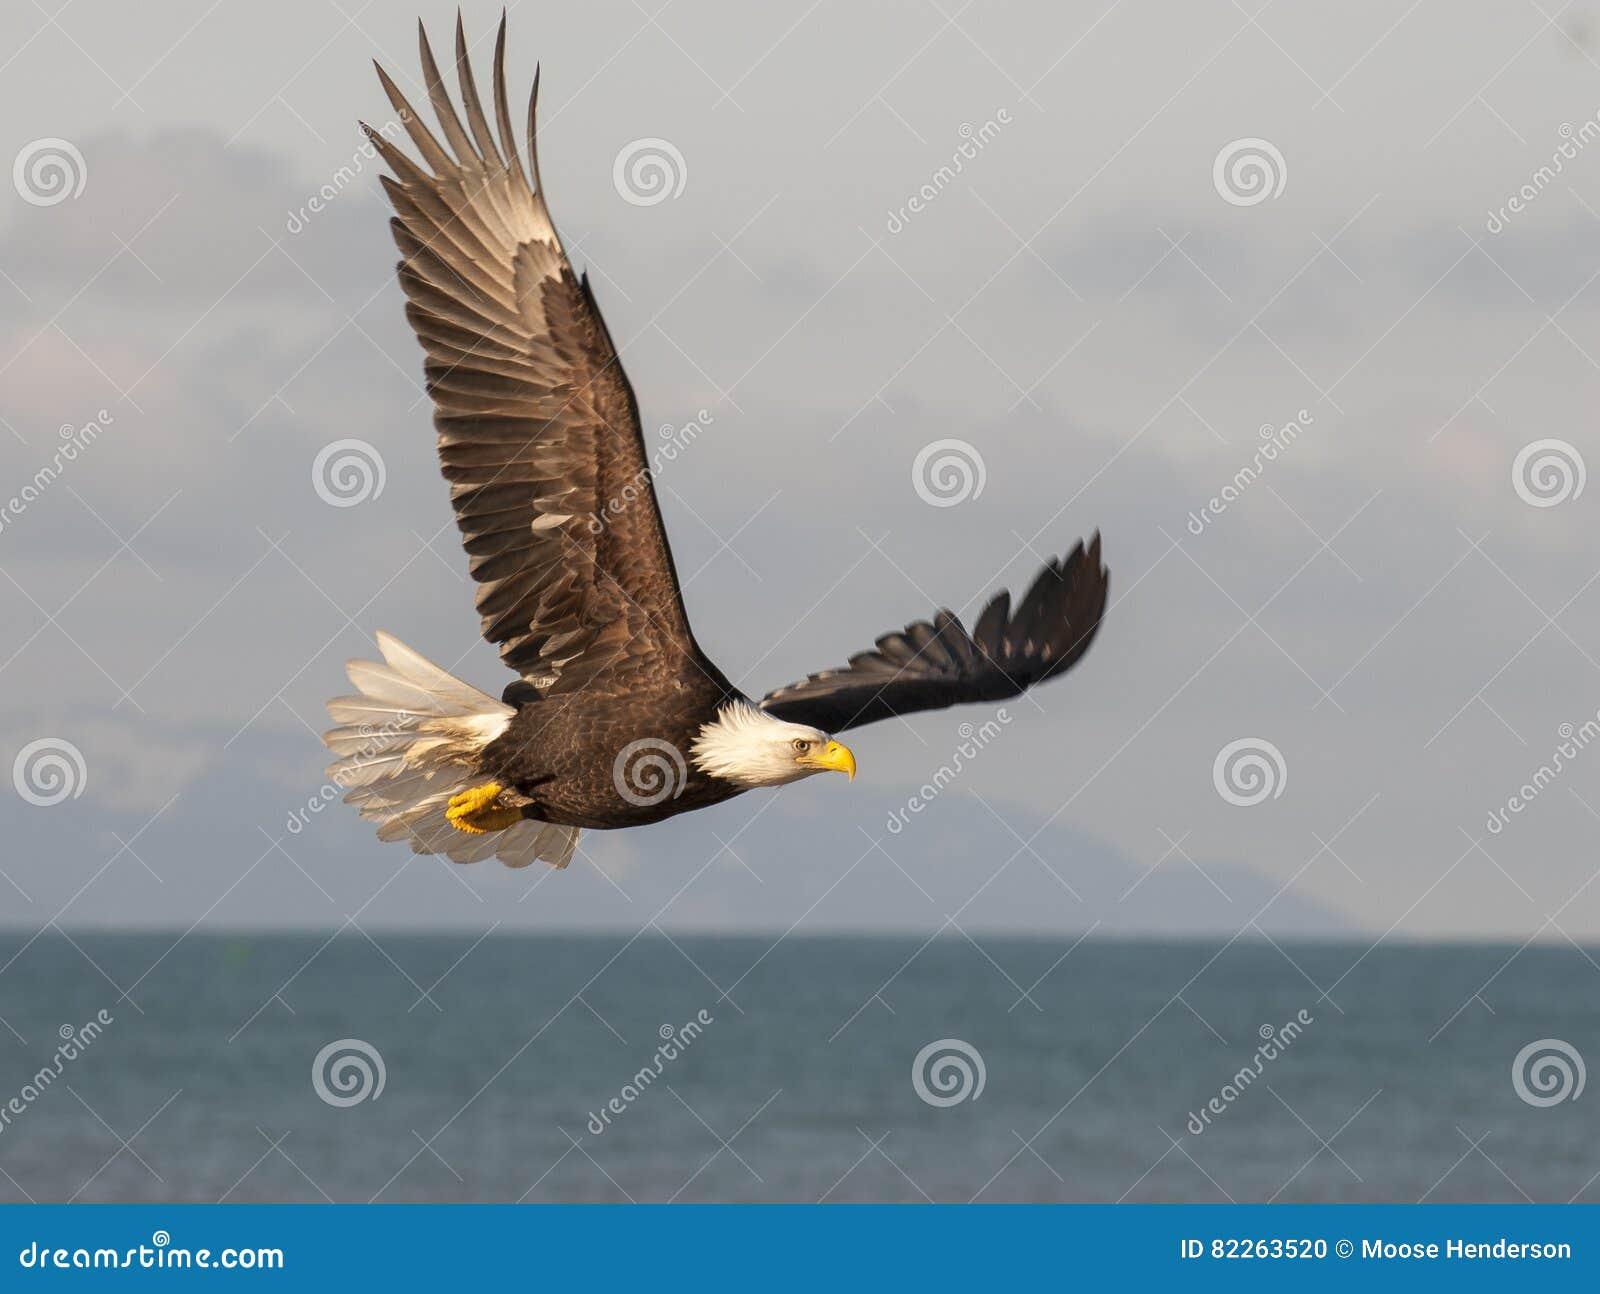 Amazing Eagle From Cadsoft Festooning - Wiring Diagram Ideas ...